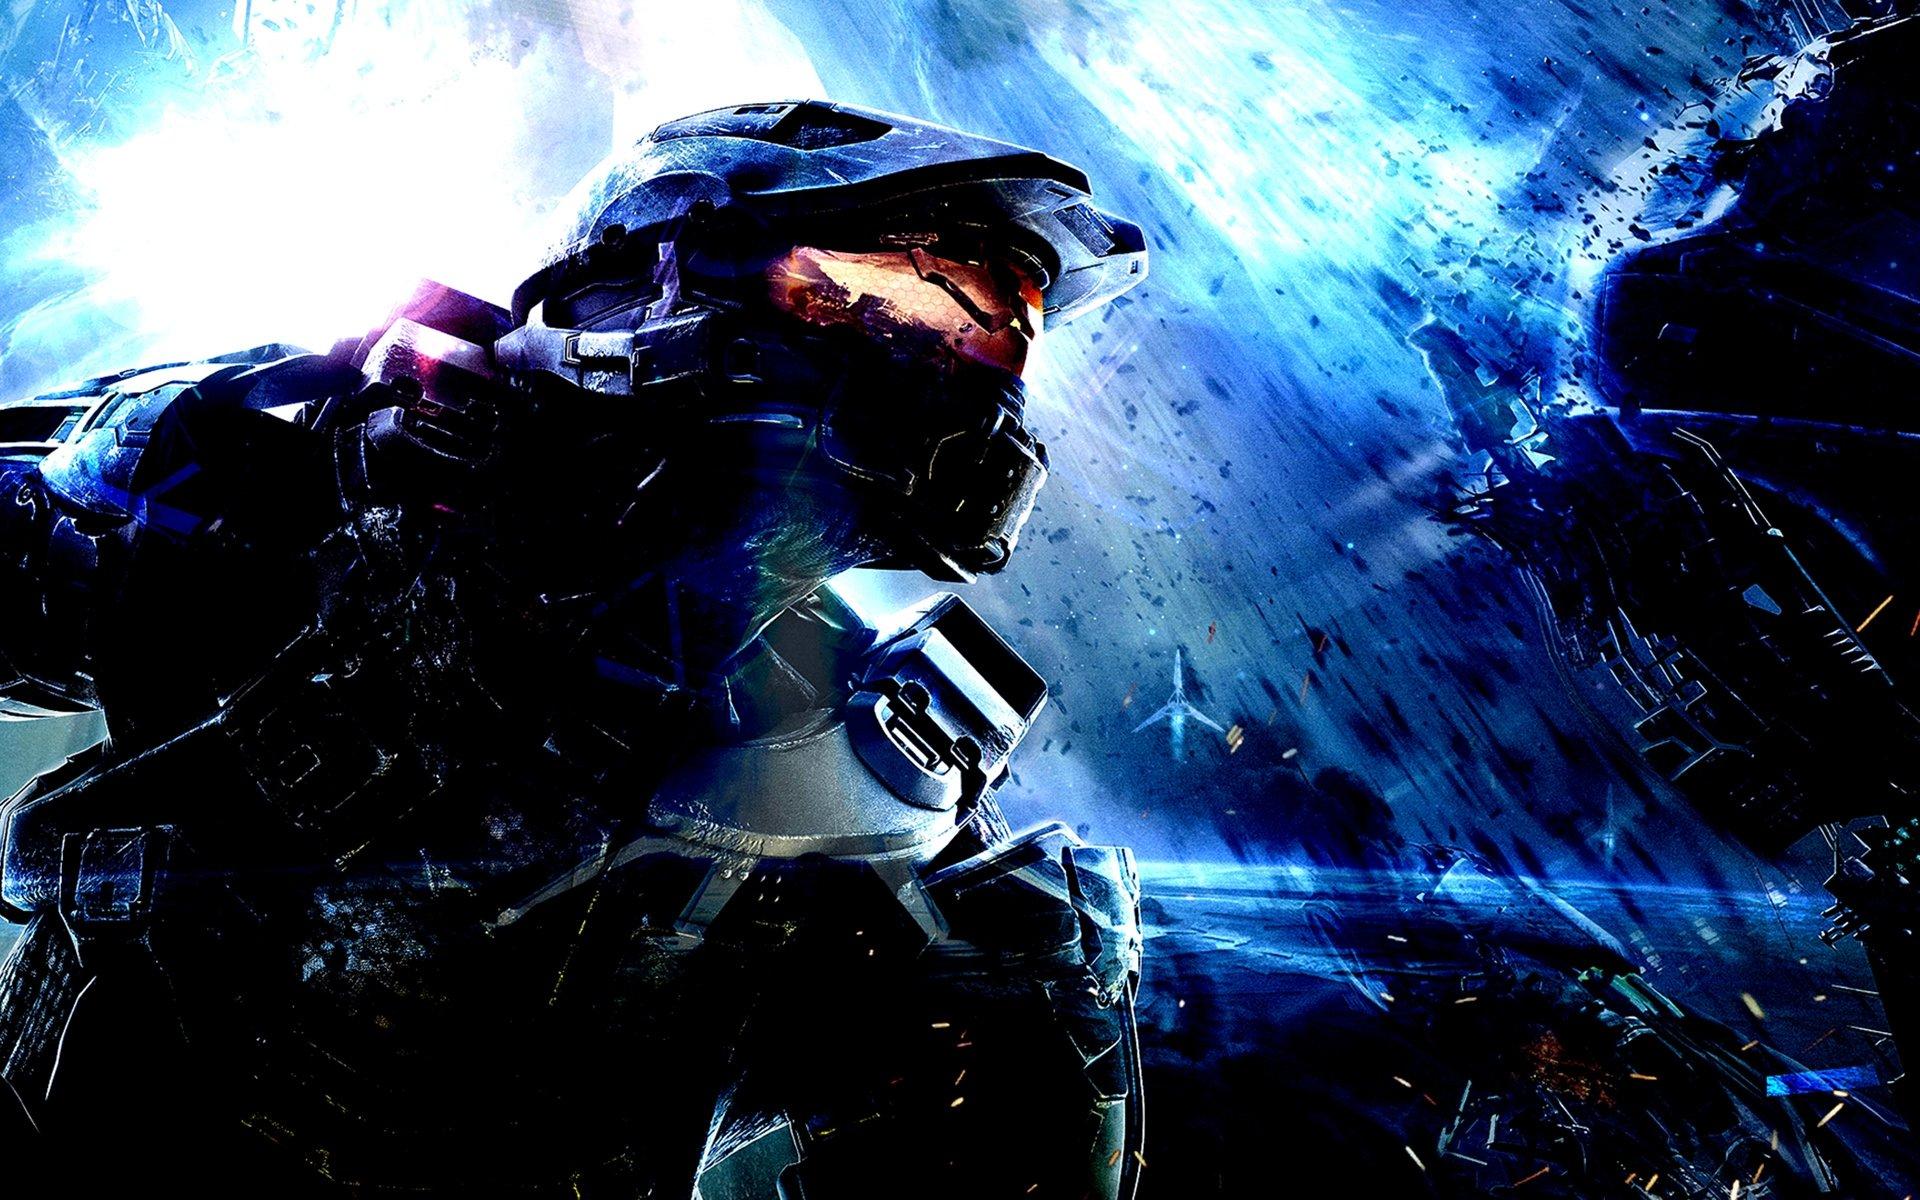 Halo 5 Guardians HD Wallpaper